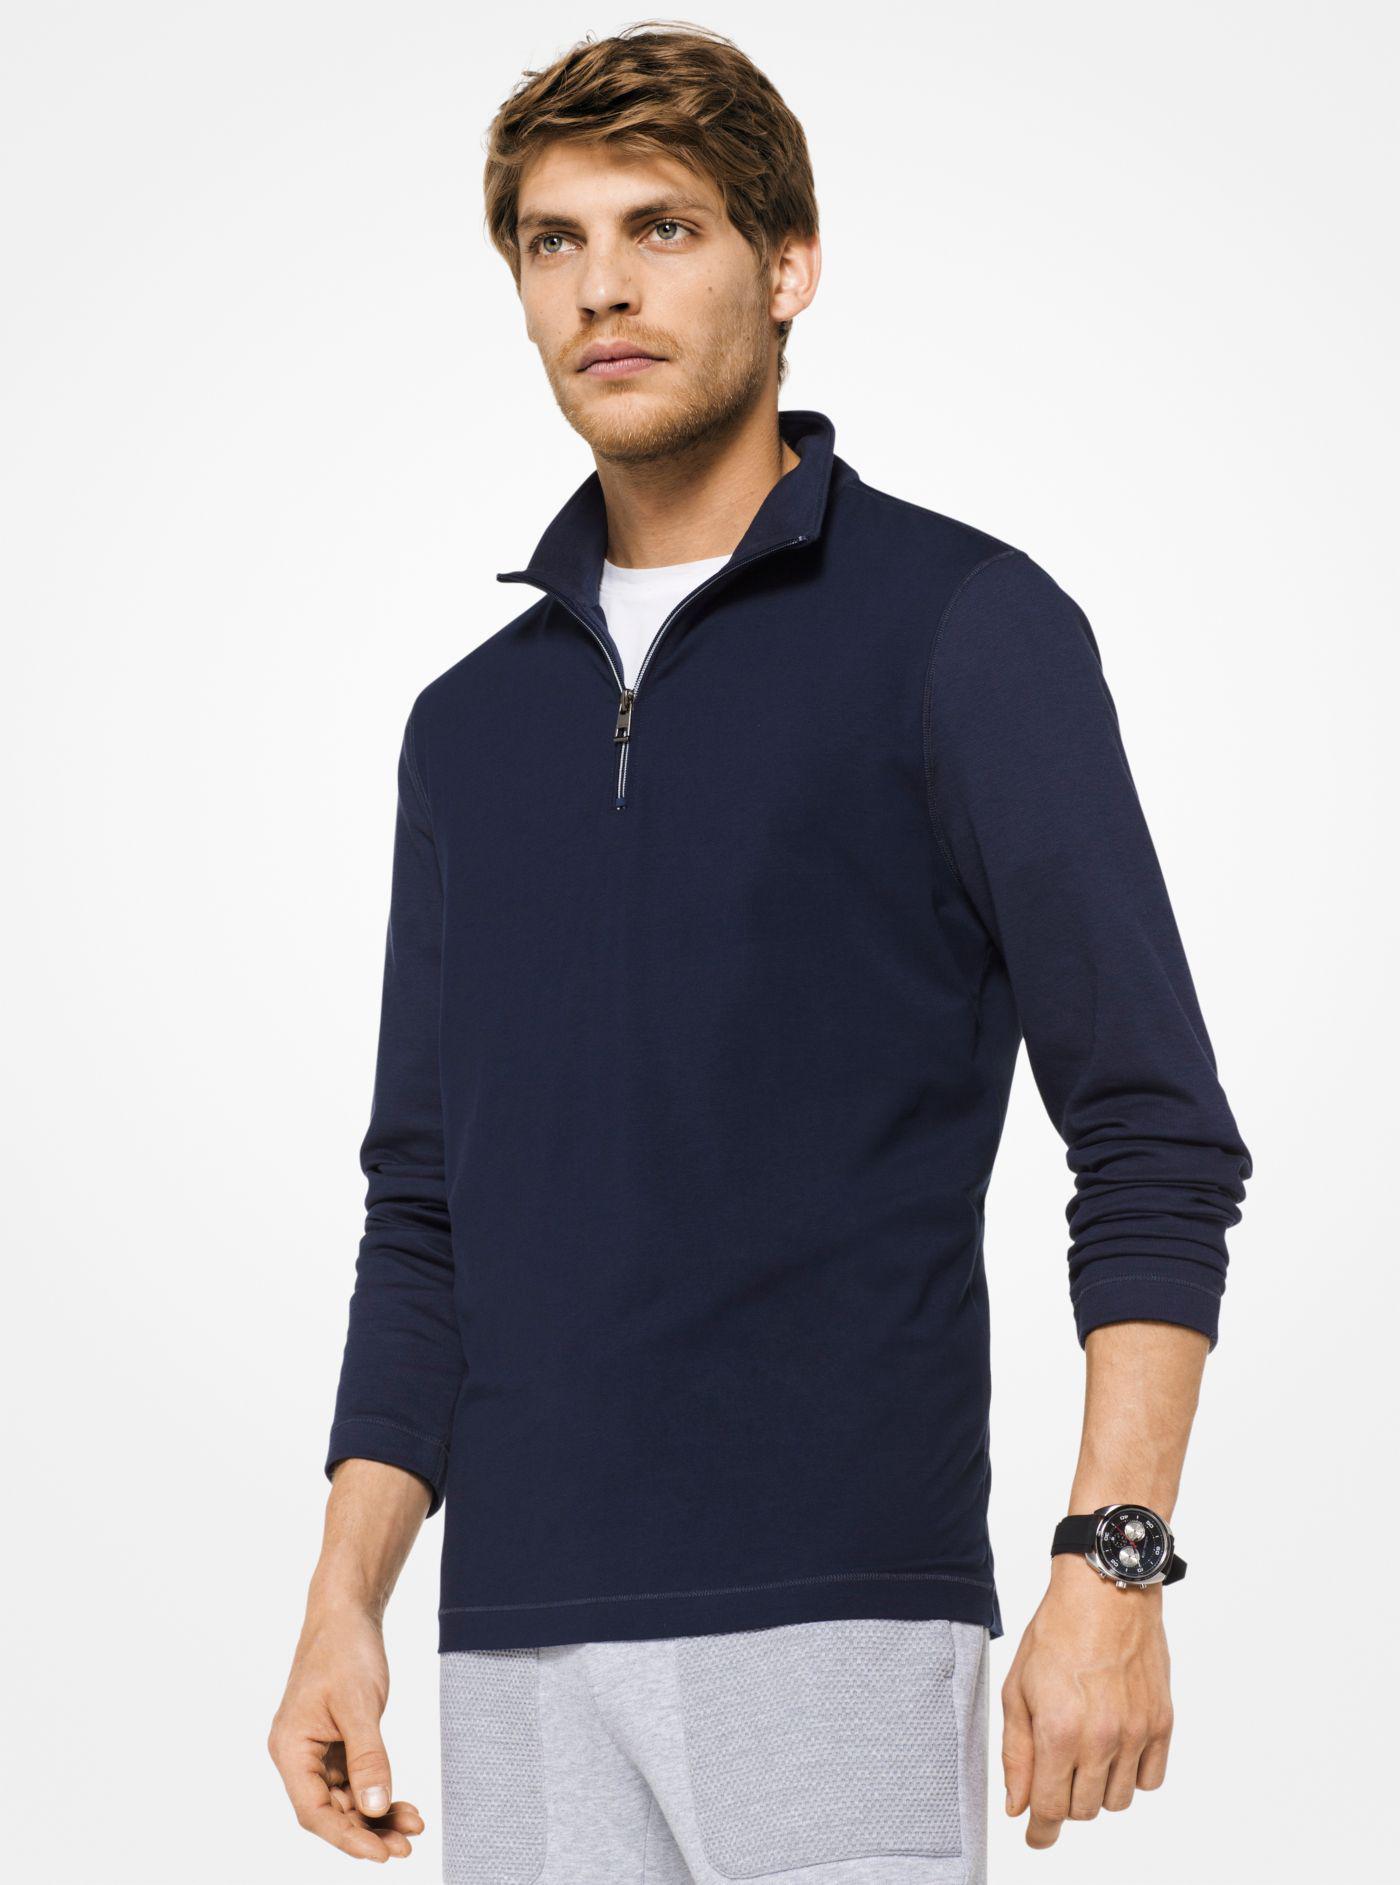 d979367308 Lyst - Michael Kors Stretch-cotton Quarter-zip Pullover in Blue for Men